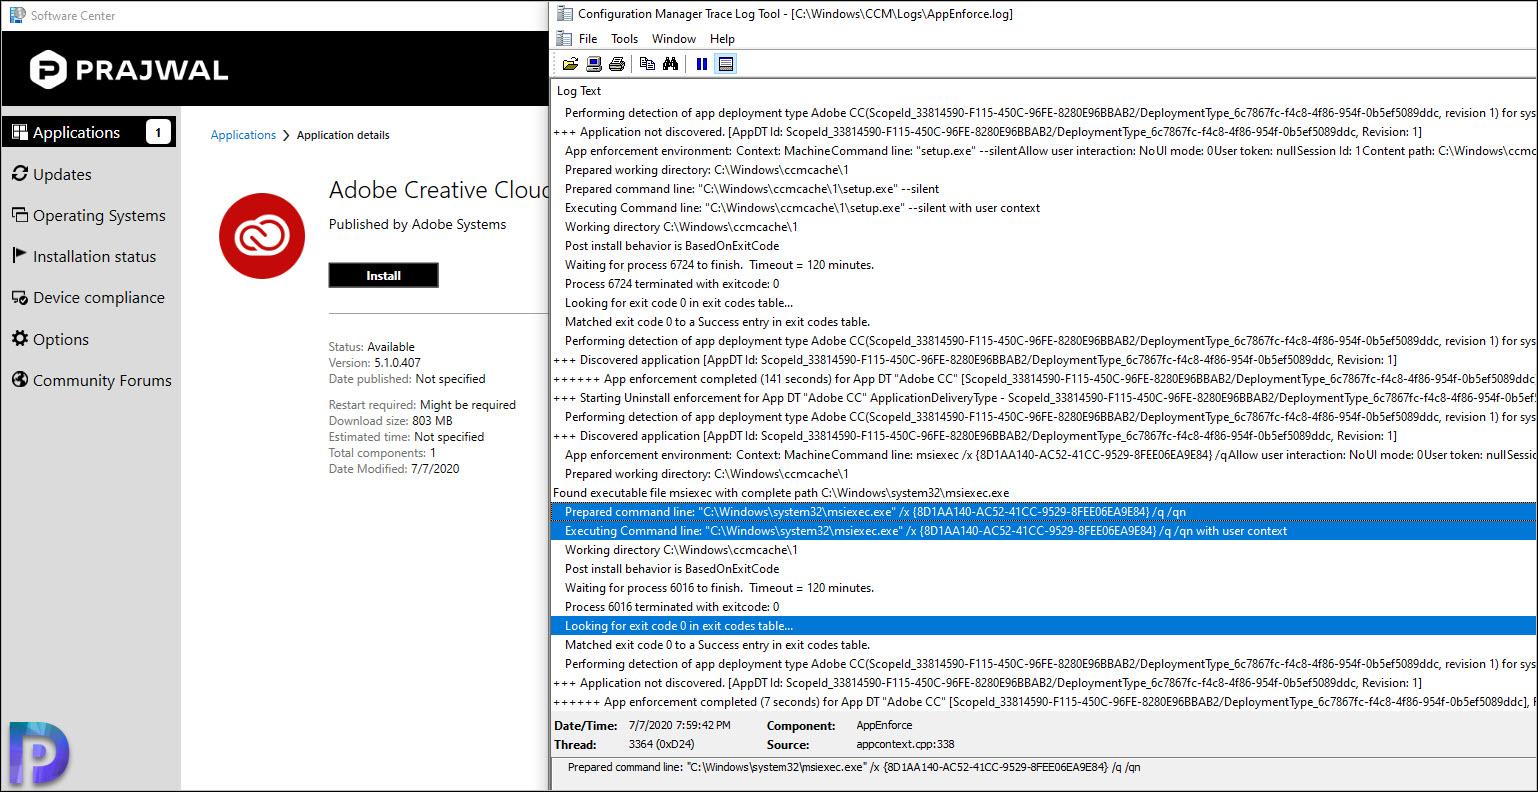 Adobe Creative Cloud App uninstall